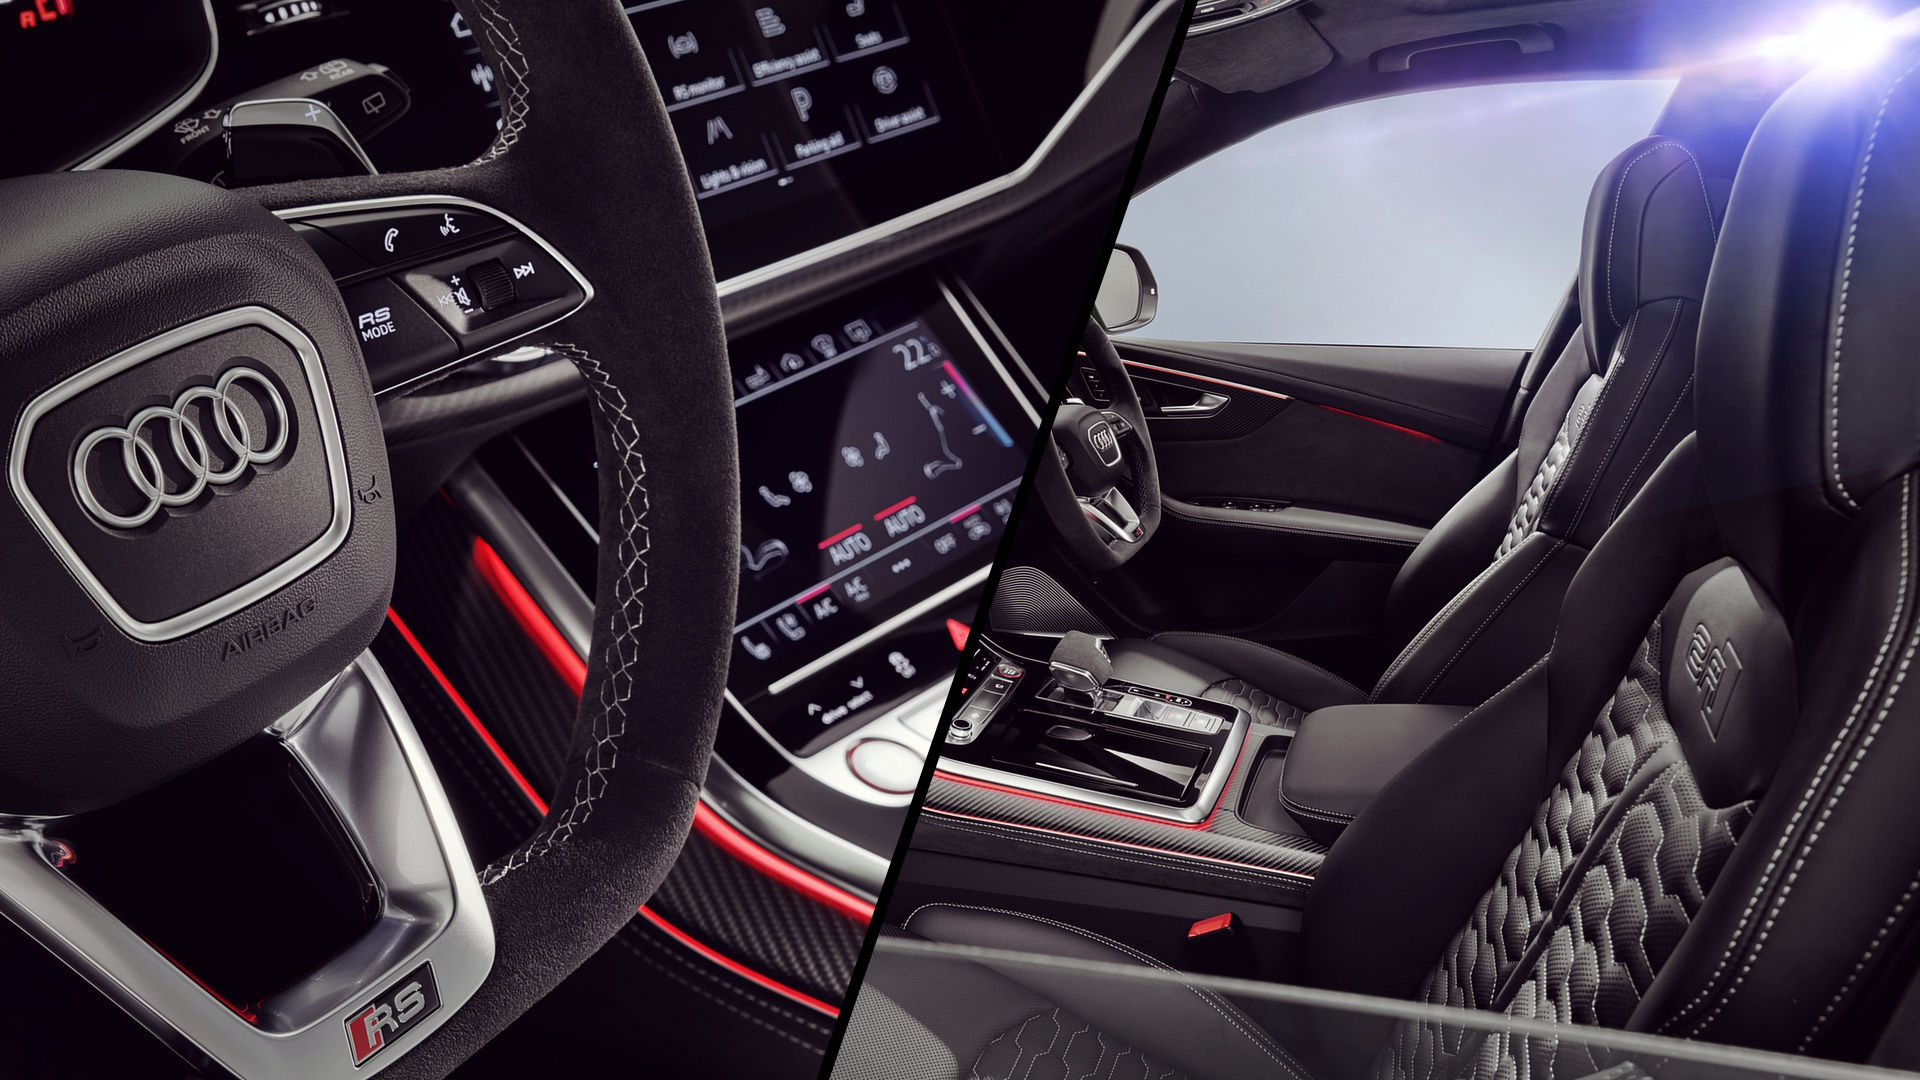 Audi RS Q8 2020 Wallpaper 1920x1080